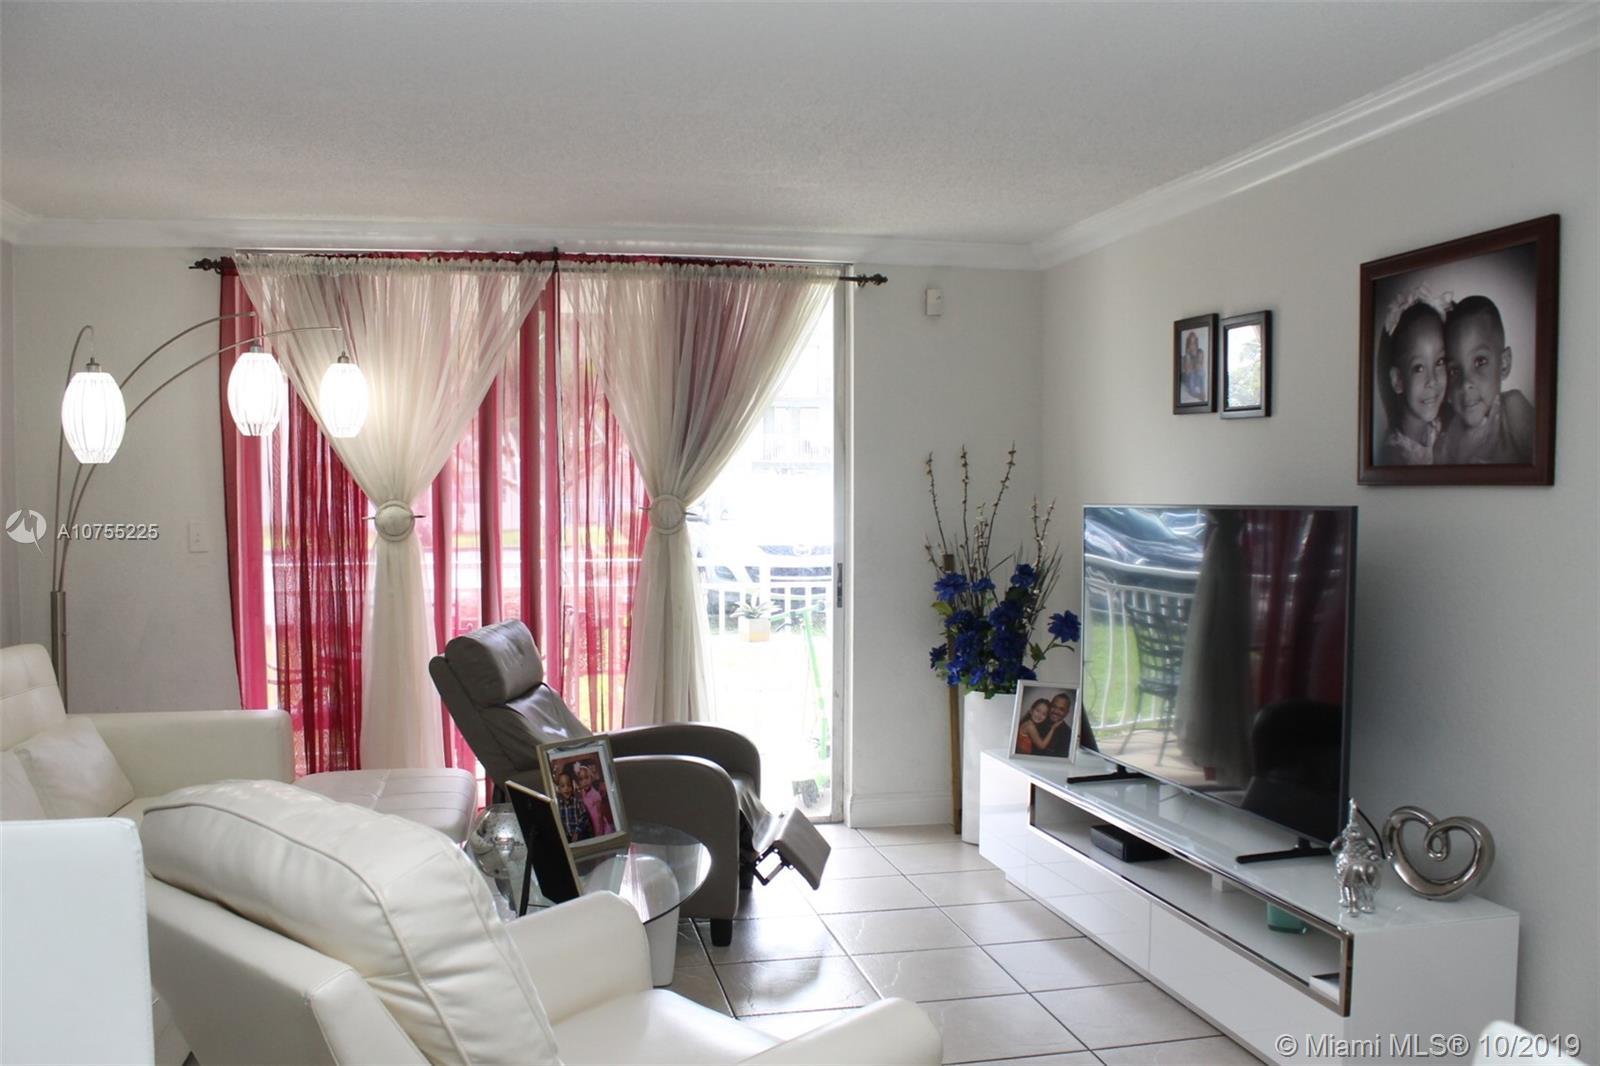 6950  Miami Gardens Dr #2-105 For Sale A10755225, FL